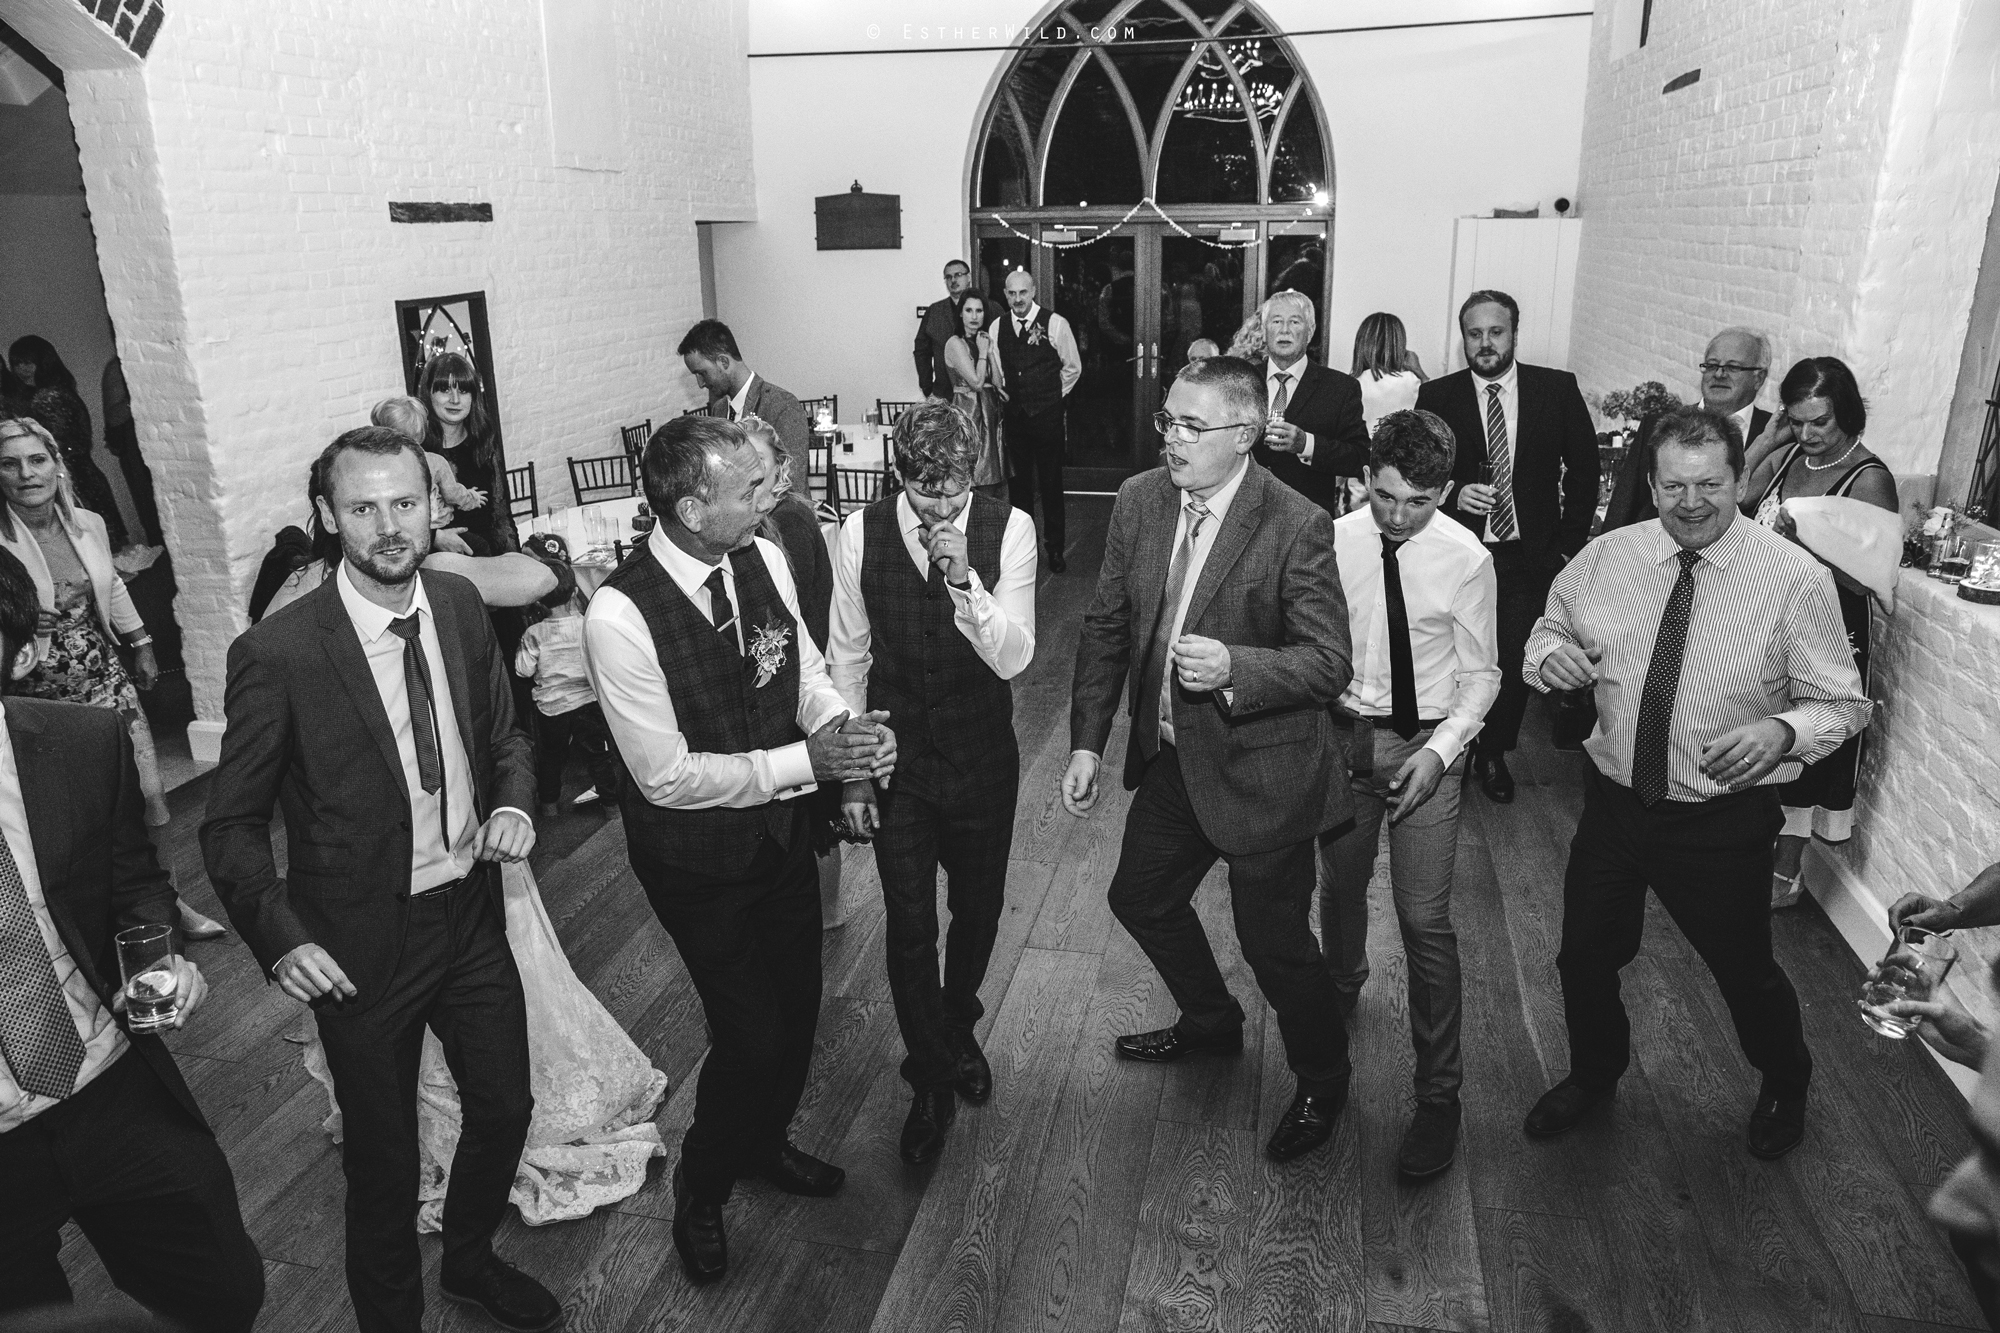 Reading_Room_Weddings_Alby_Norwich_Photographer_Esther_Wild_IMG_3909-1.jpg